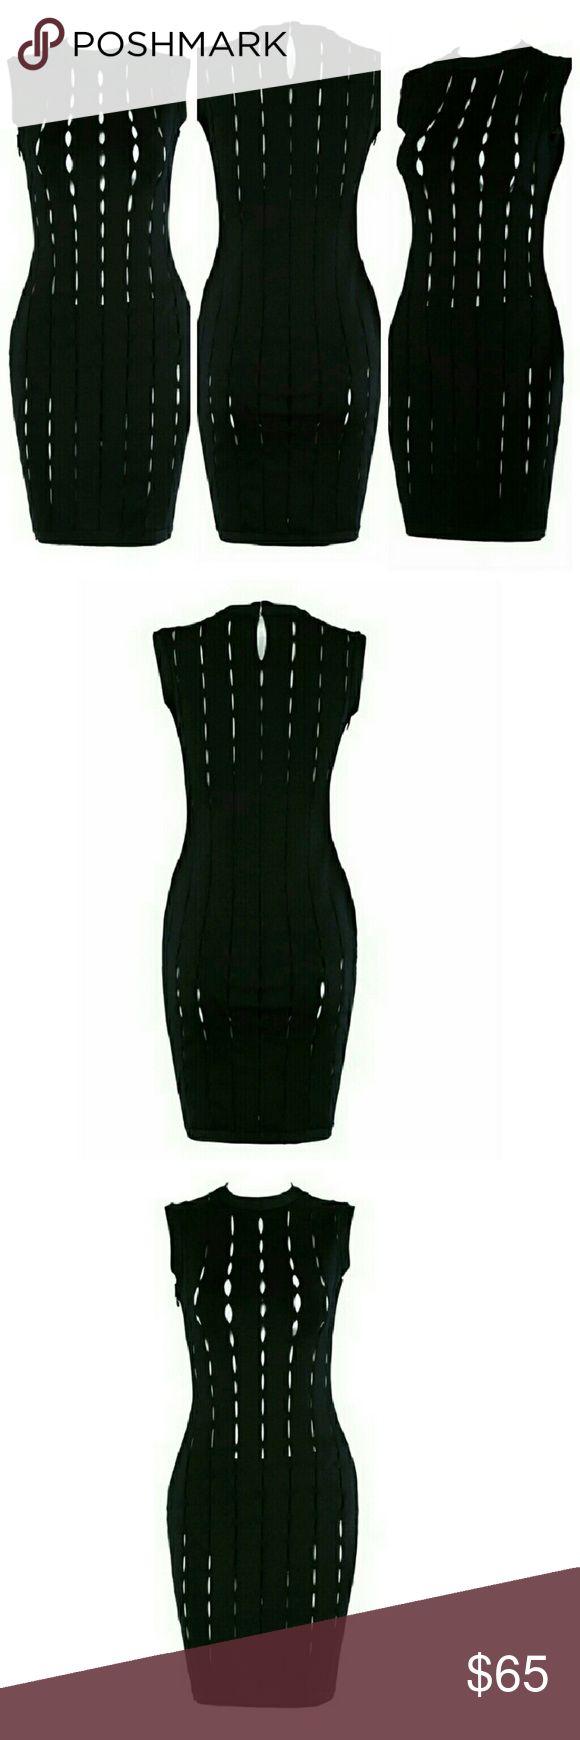 Lil Black Dress Bandages dress hole out tank black apricot mini bodycon elegant sexy women evening party dress Dresses Mini